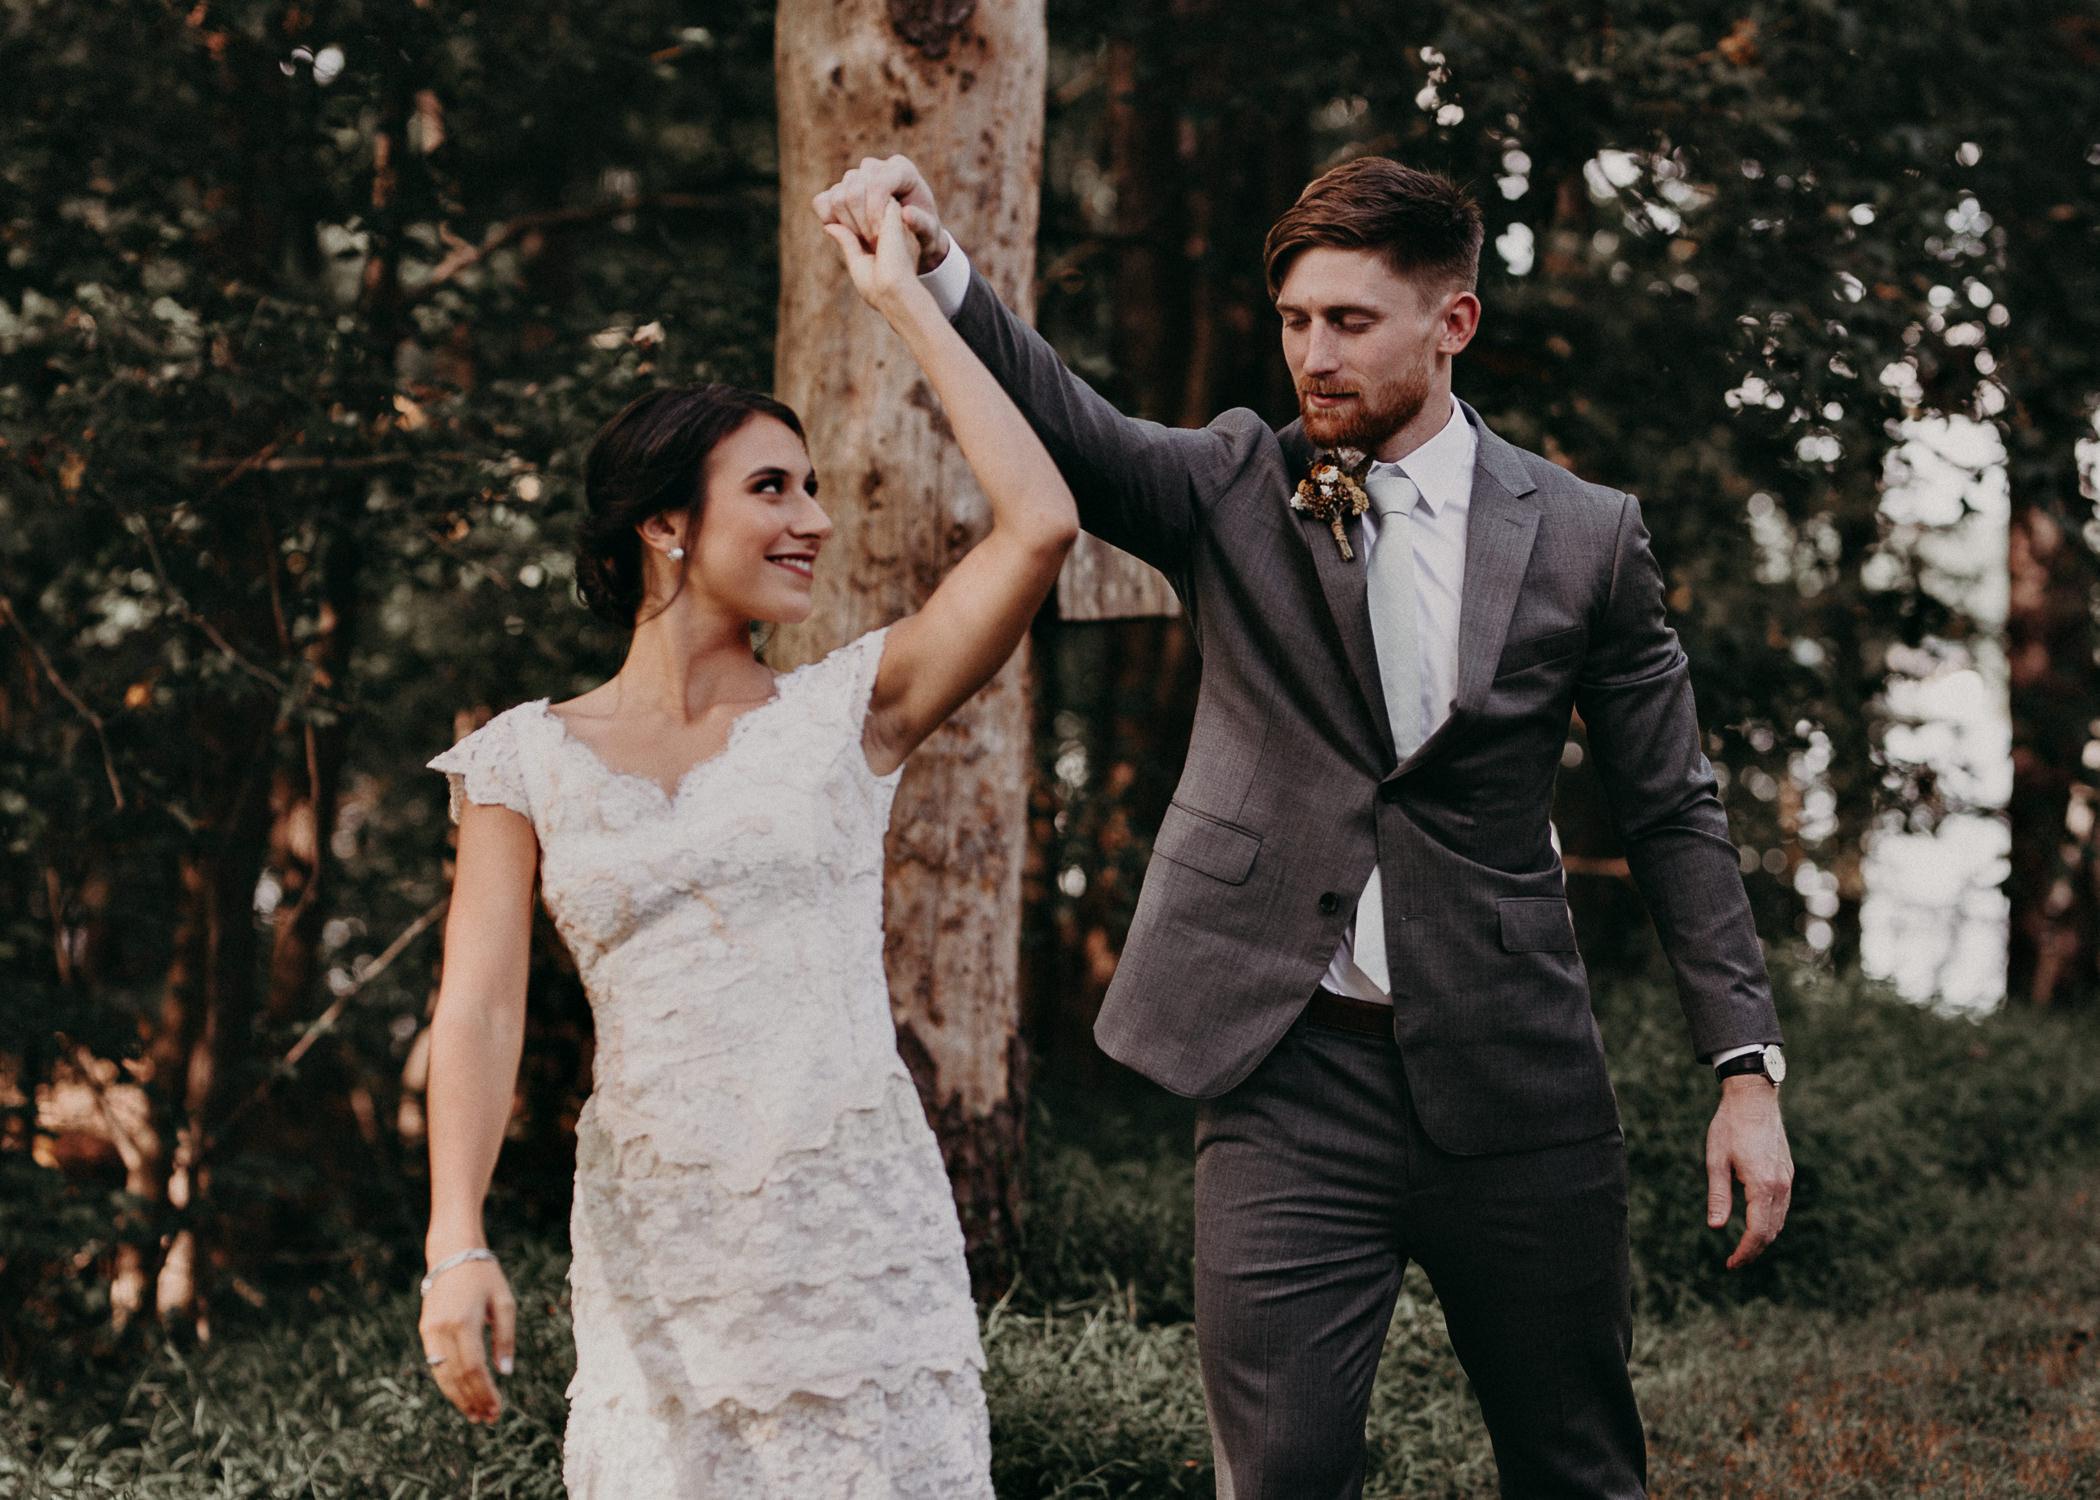 42 Bride & Groom first look before the ceremony on wedding day - Atlanta Wedding Photographer .jpg